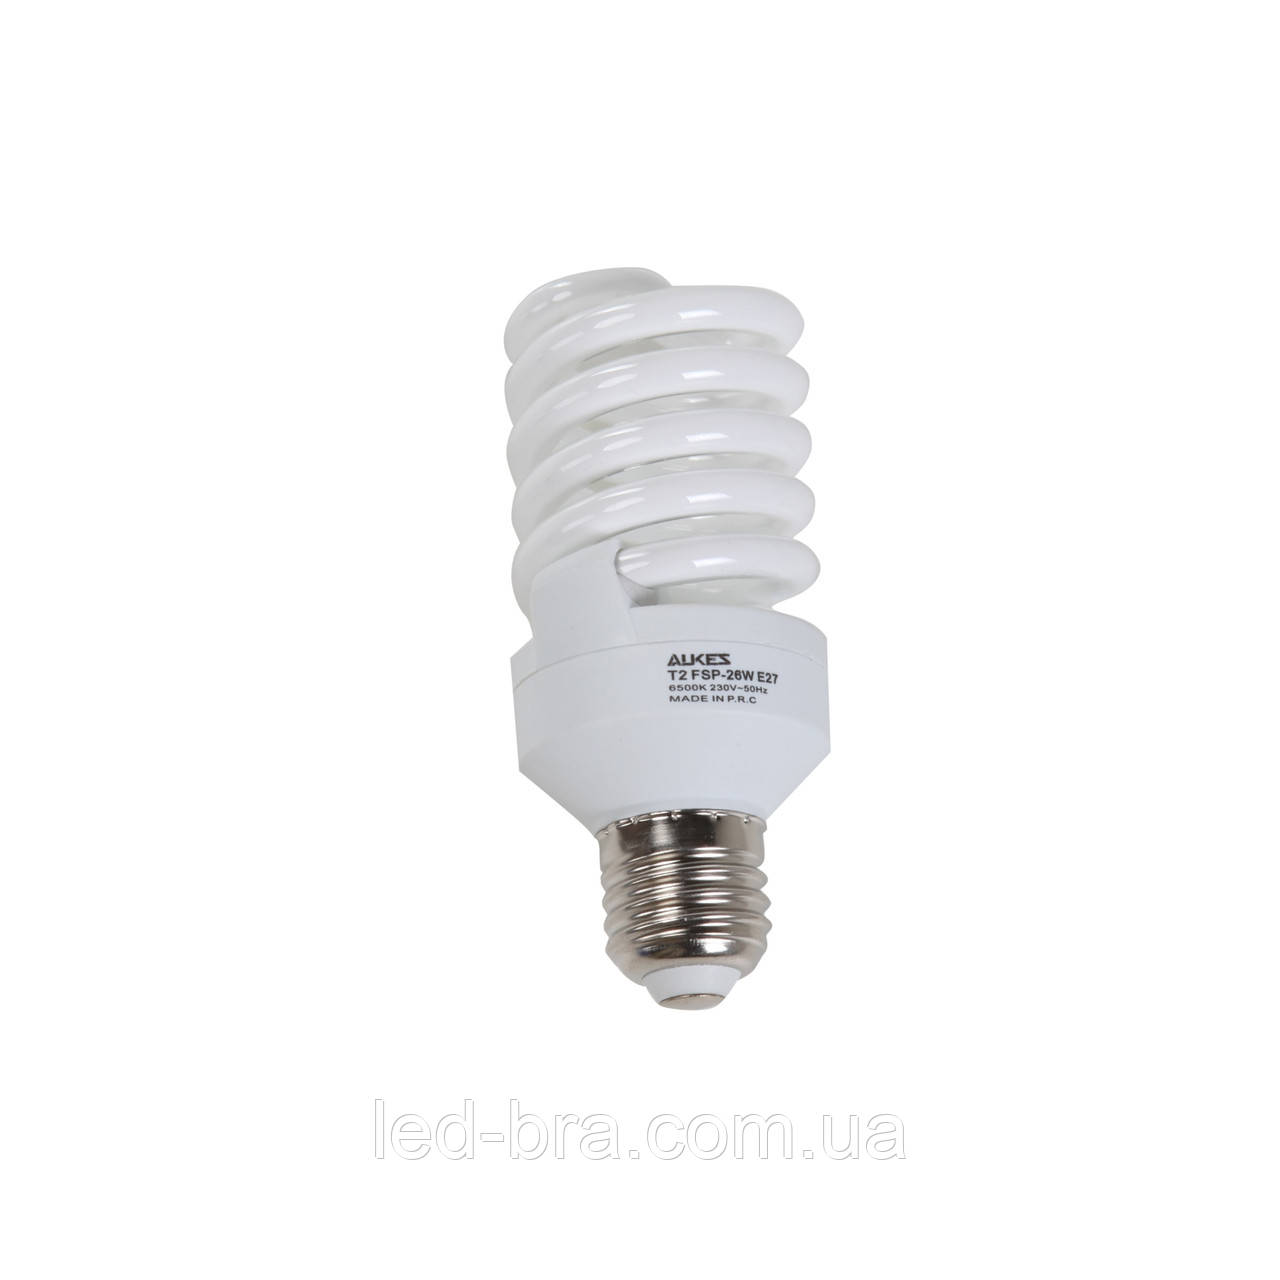 Энергосберегающая лампа NurLed 65W